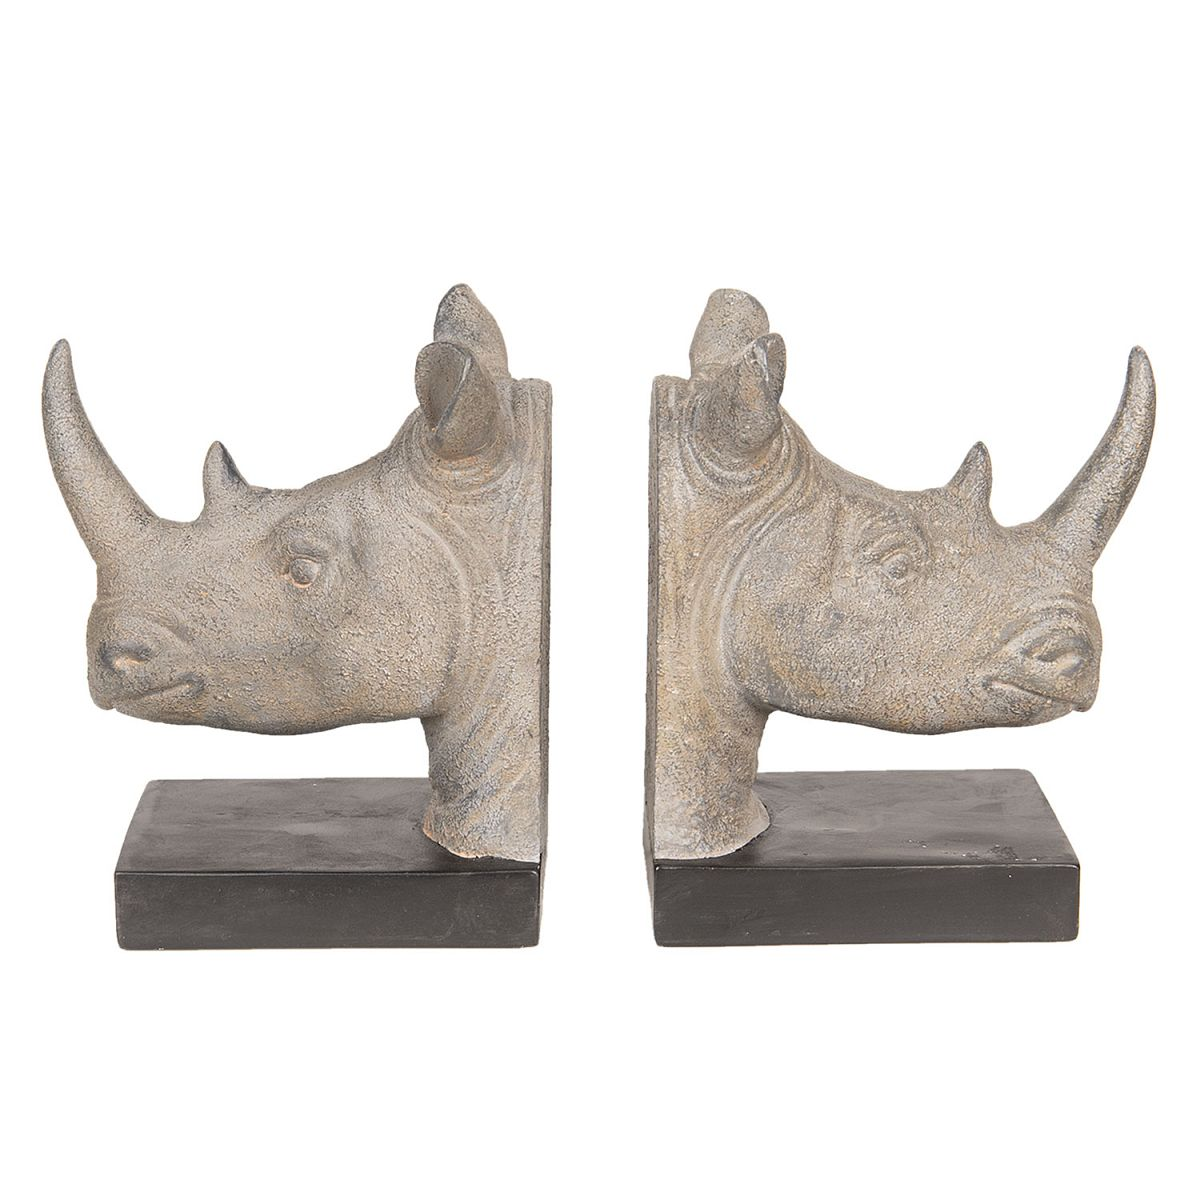 Zarážka na knihy nosorožec Rhino Clayre Eef